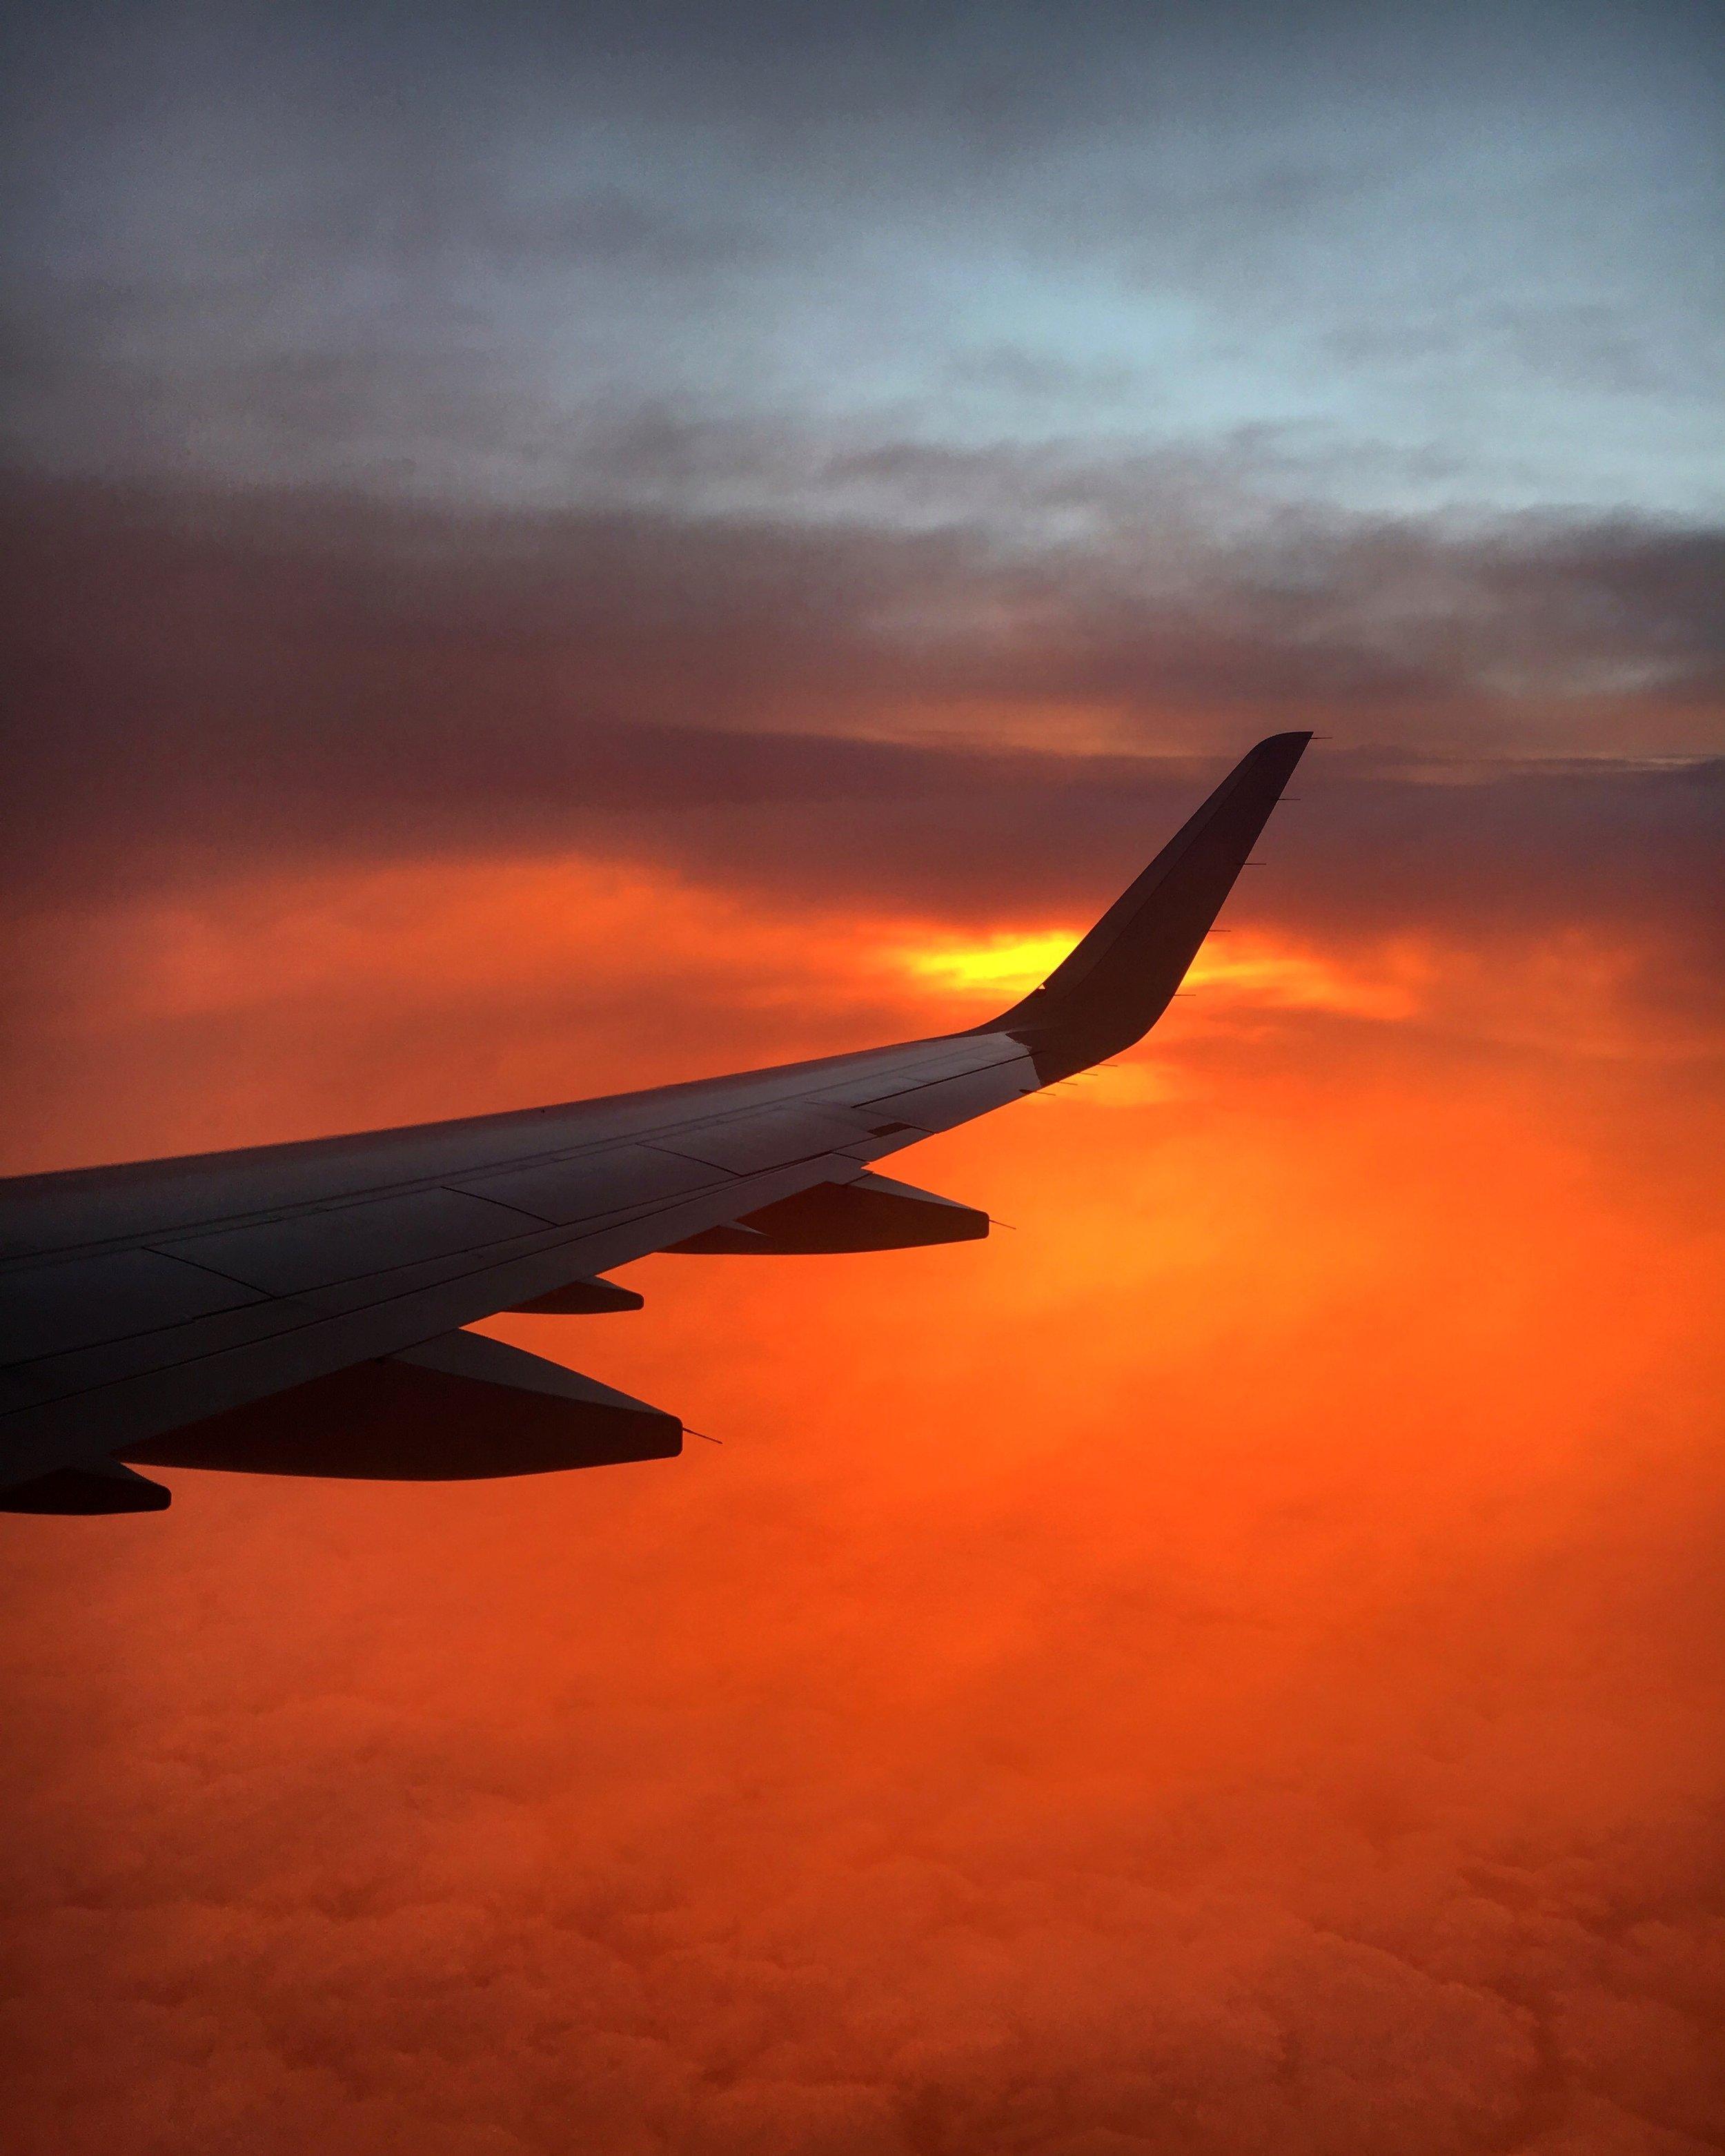 Sunrise as we flew into Dallas, TX.